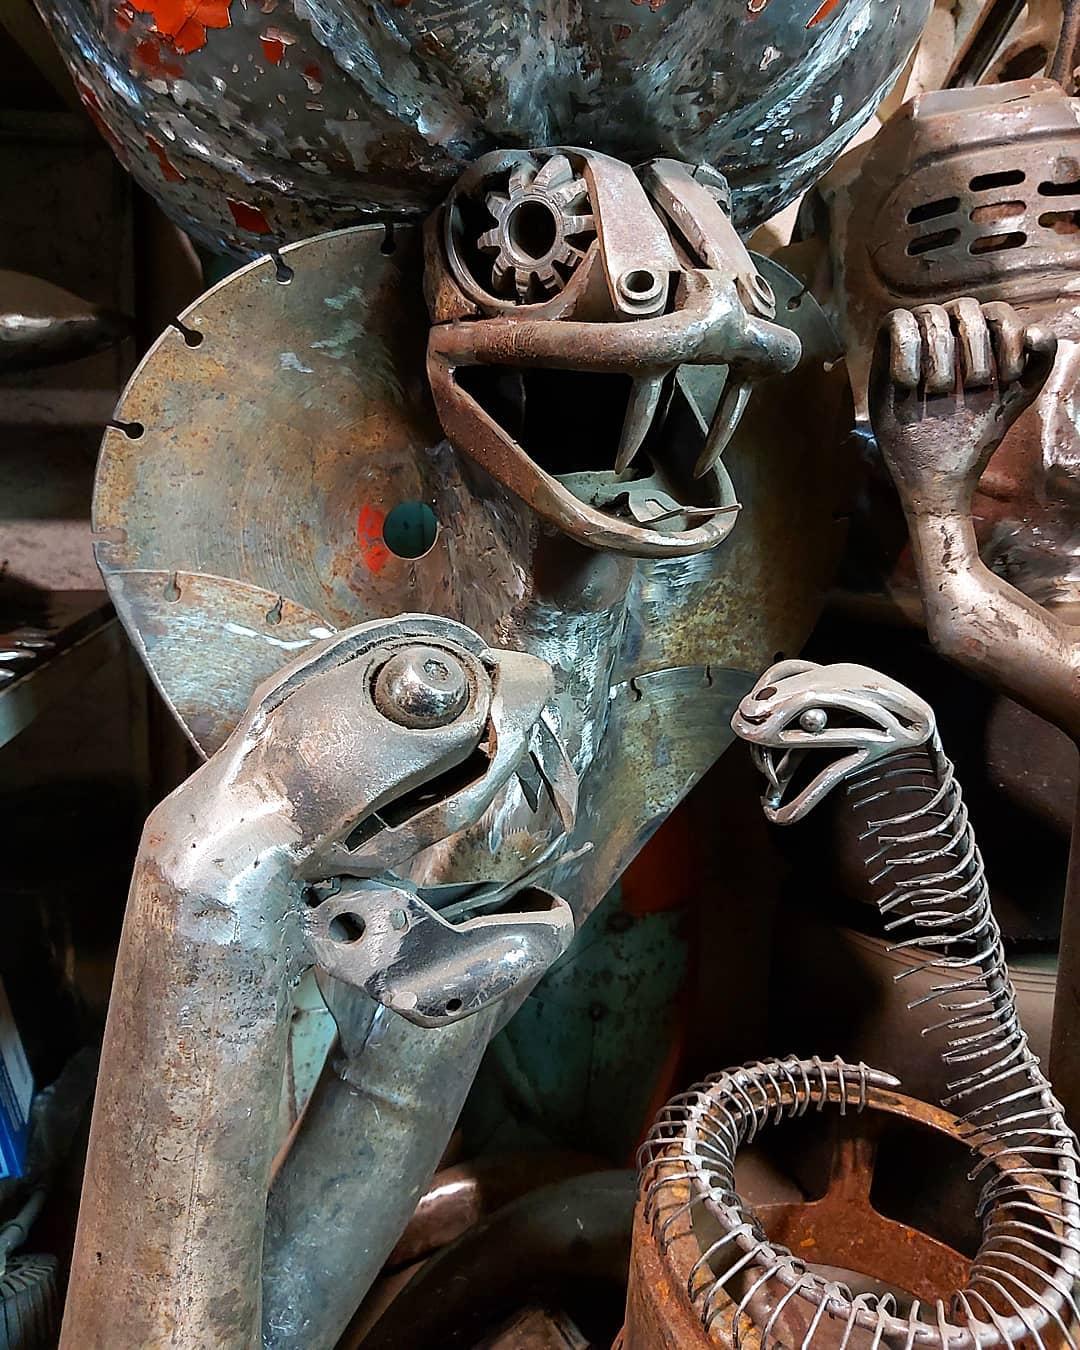 sasimovich-vasya-metal-sculptures-image-7